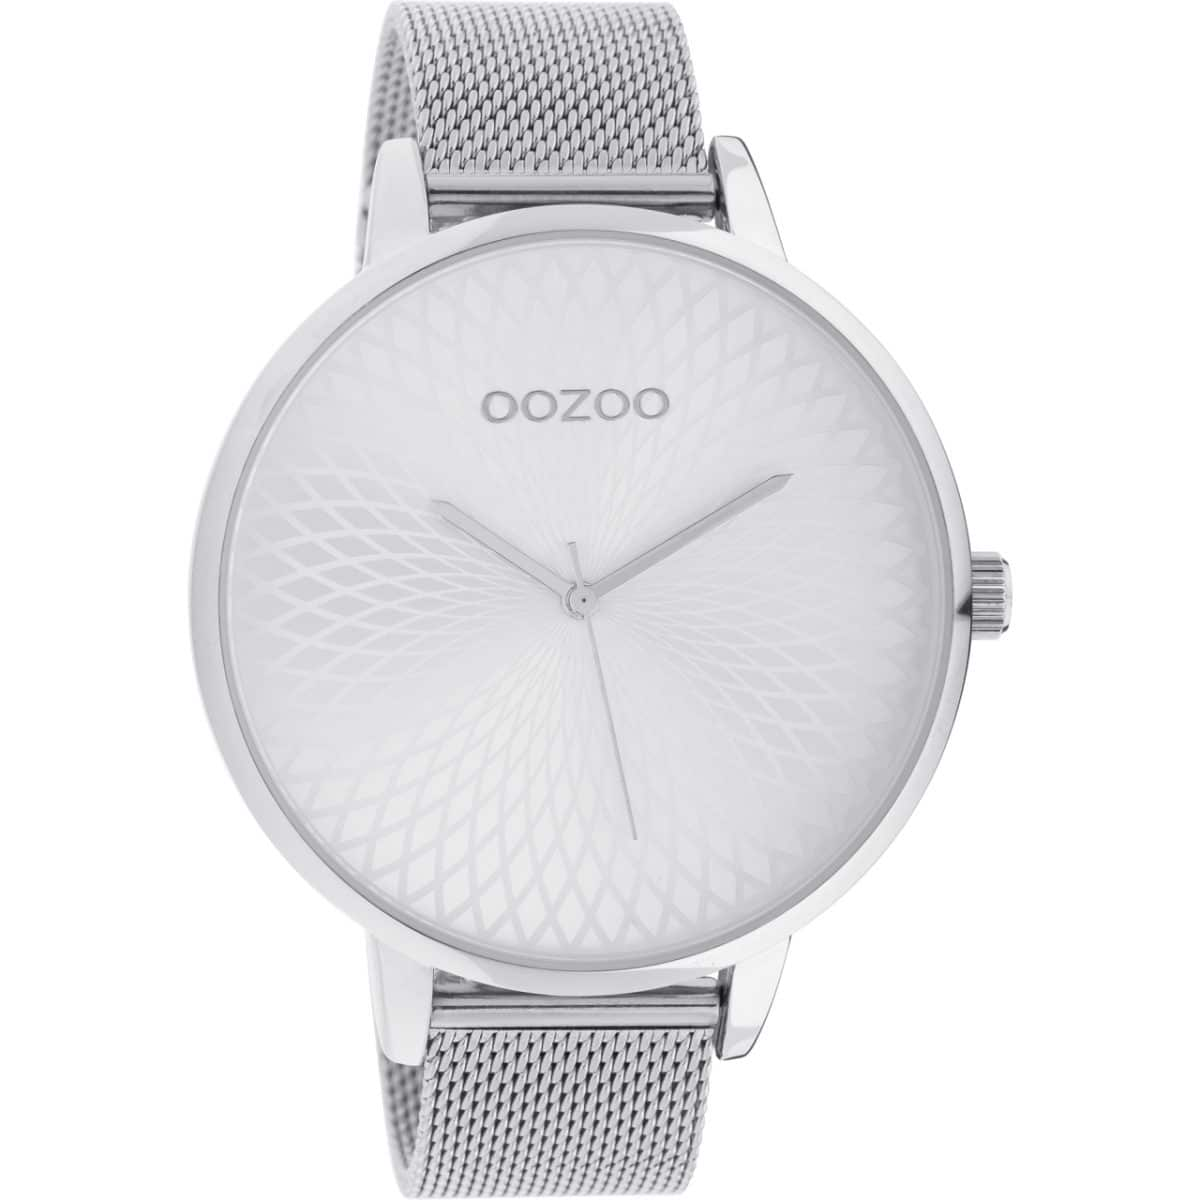 Timepieces Summer 2020 - C10550 - OOZOO